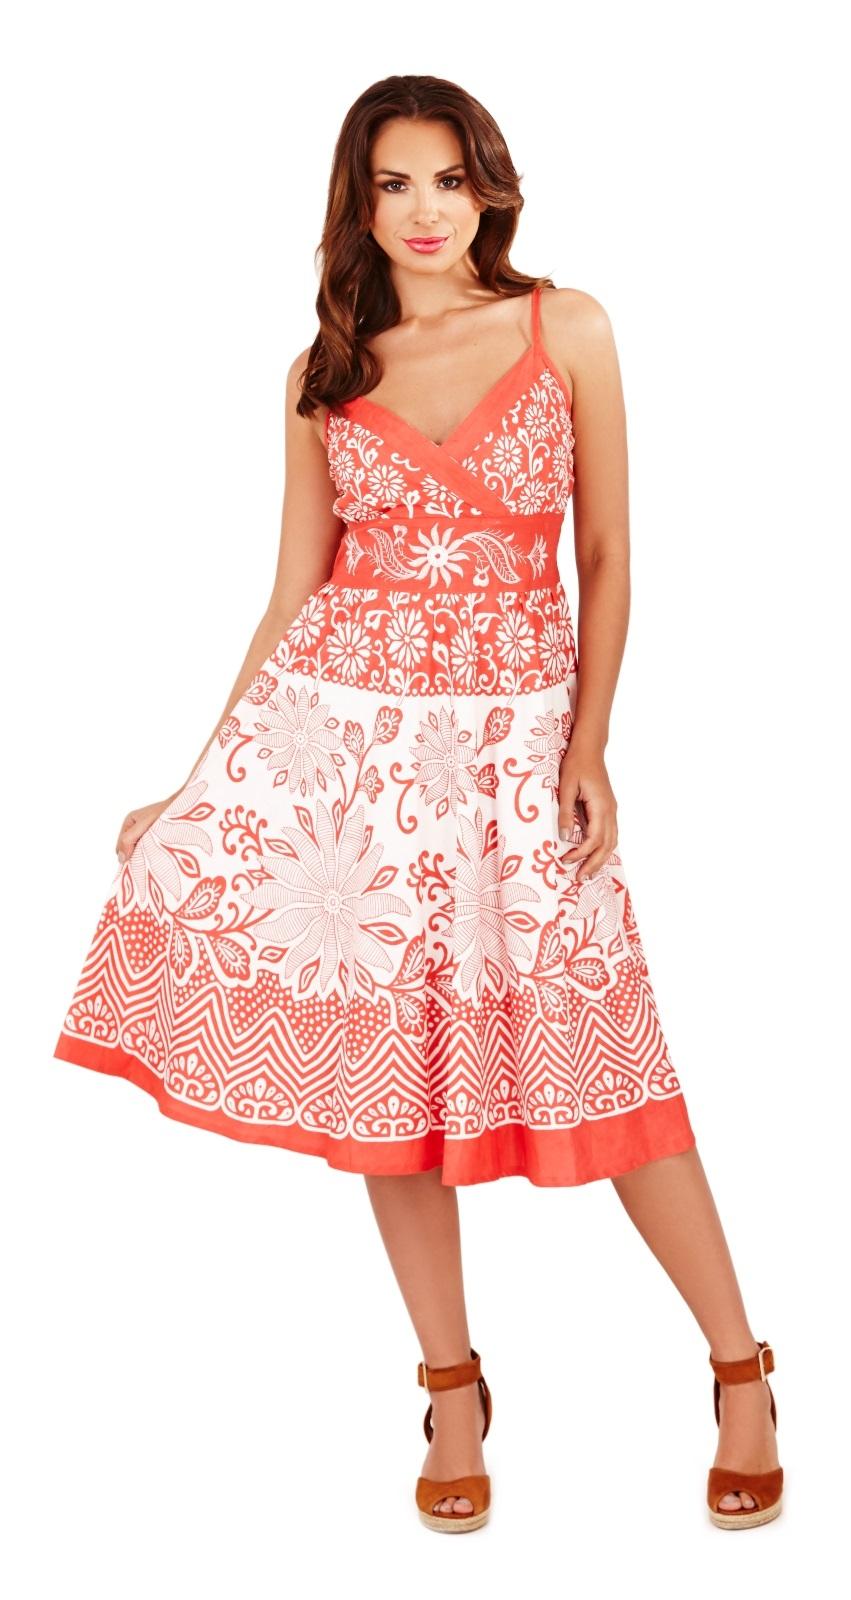 83185c6d025f Womens Summer Dress 100% Cotton V Neck Floral Mid Length Ladies Size ...